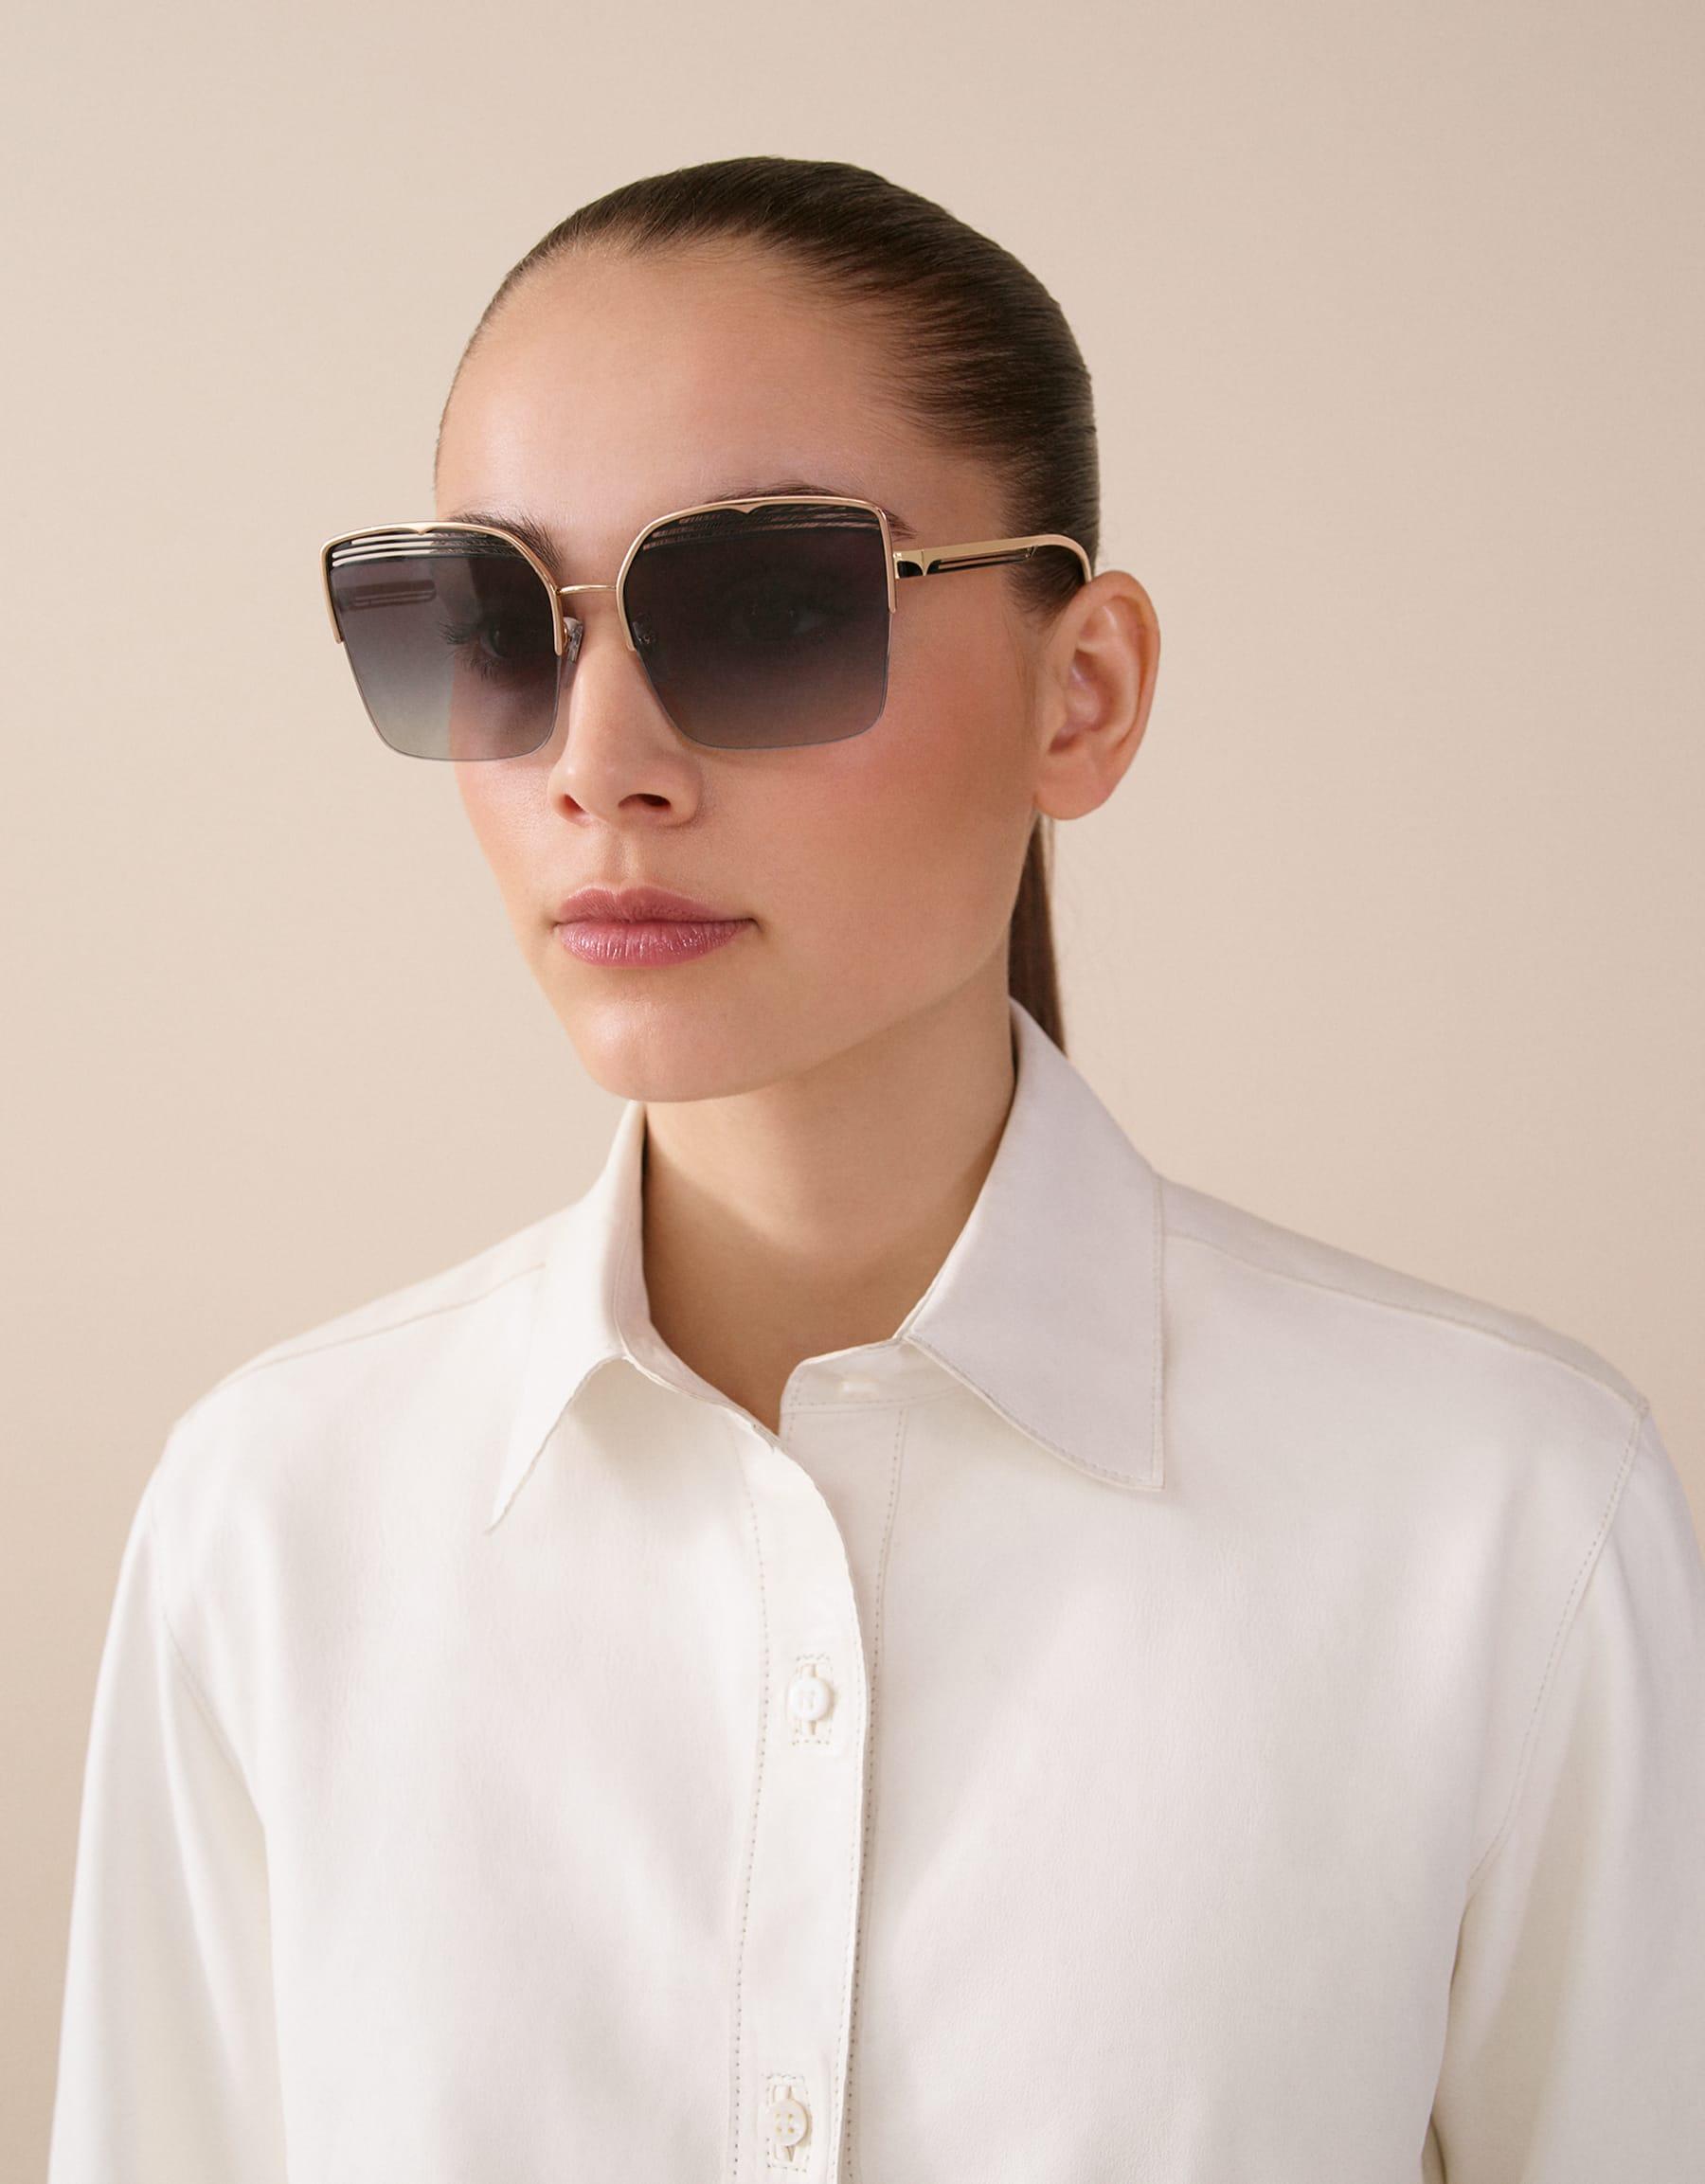 Bvlgari B.zero1 B.overvibe half-rim square metal sunglasses. 903810 image 3